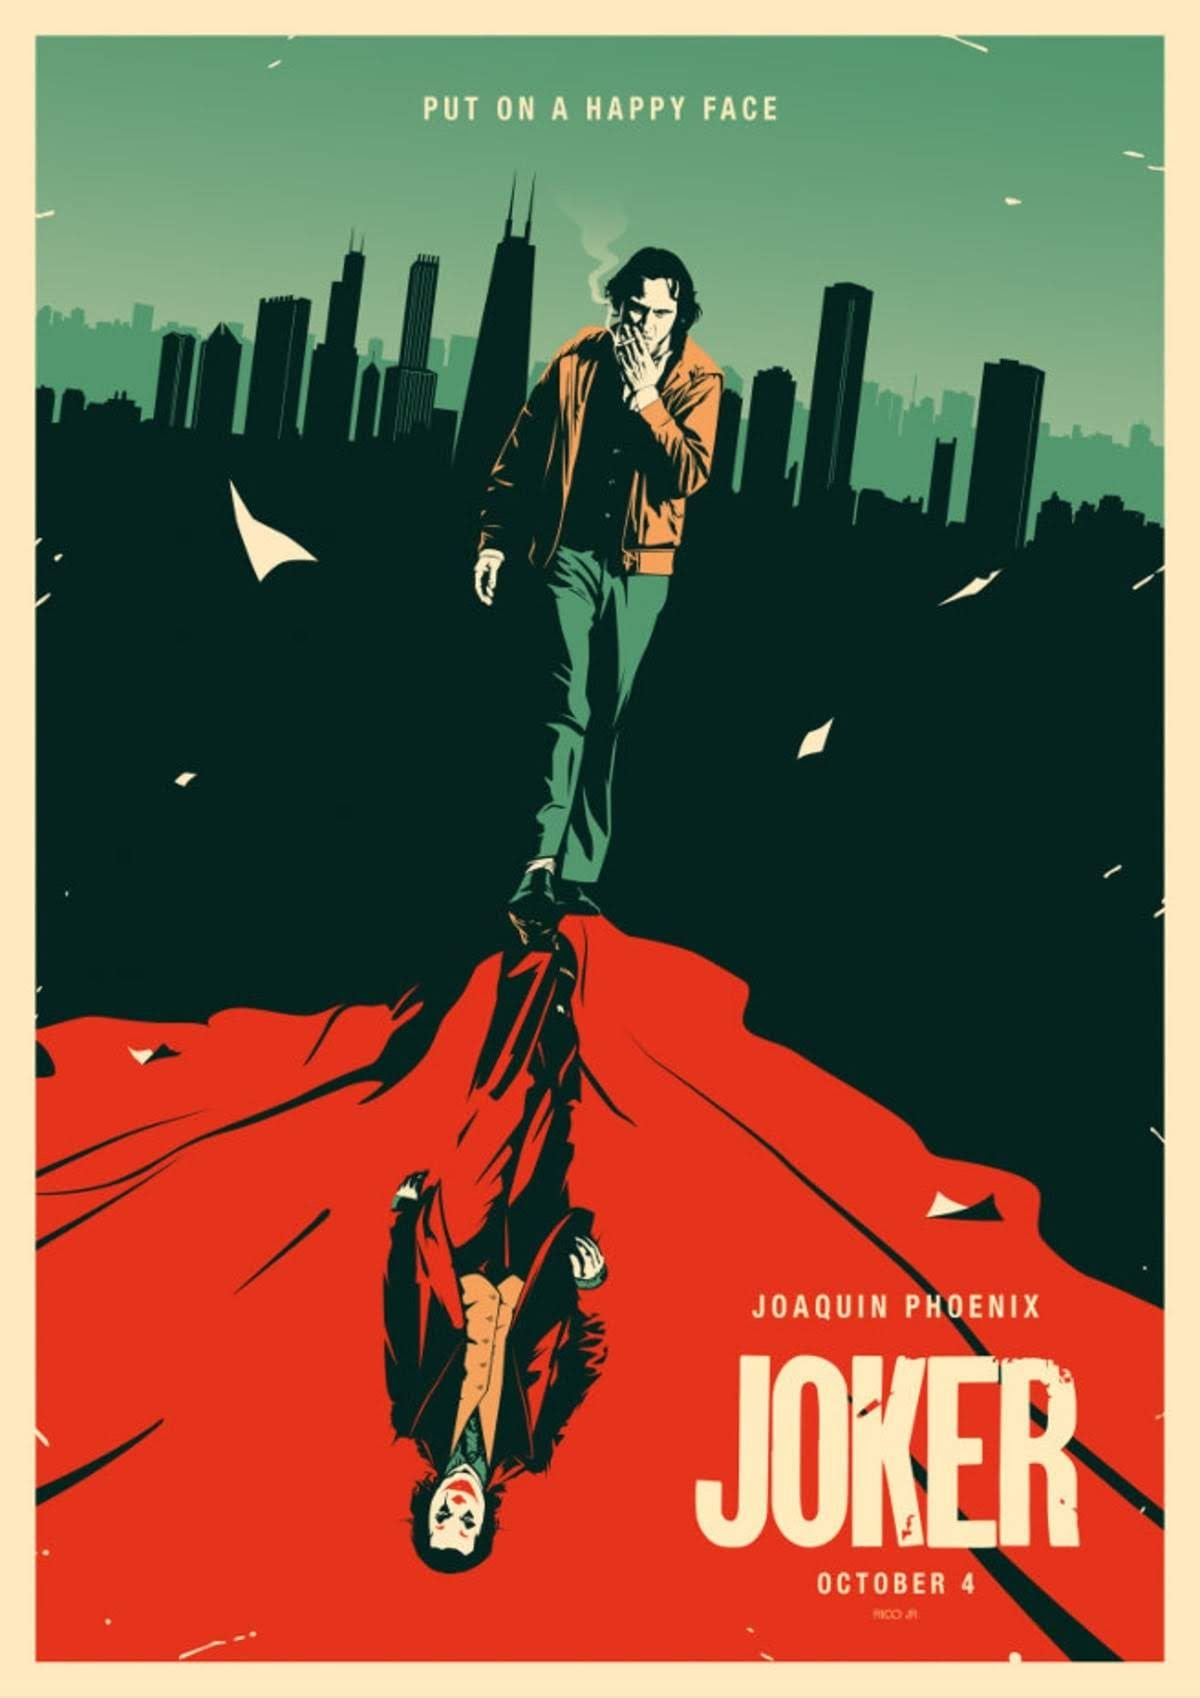 Joker by Julien Rico Jr. : ホアキン・フェニックス主演のアンチ・ヒーロー映画の大ヒット作「ジョーカー」を描いたスタイリッシュなアート・ポスター ! !